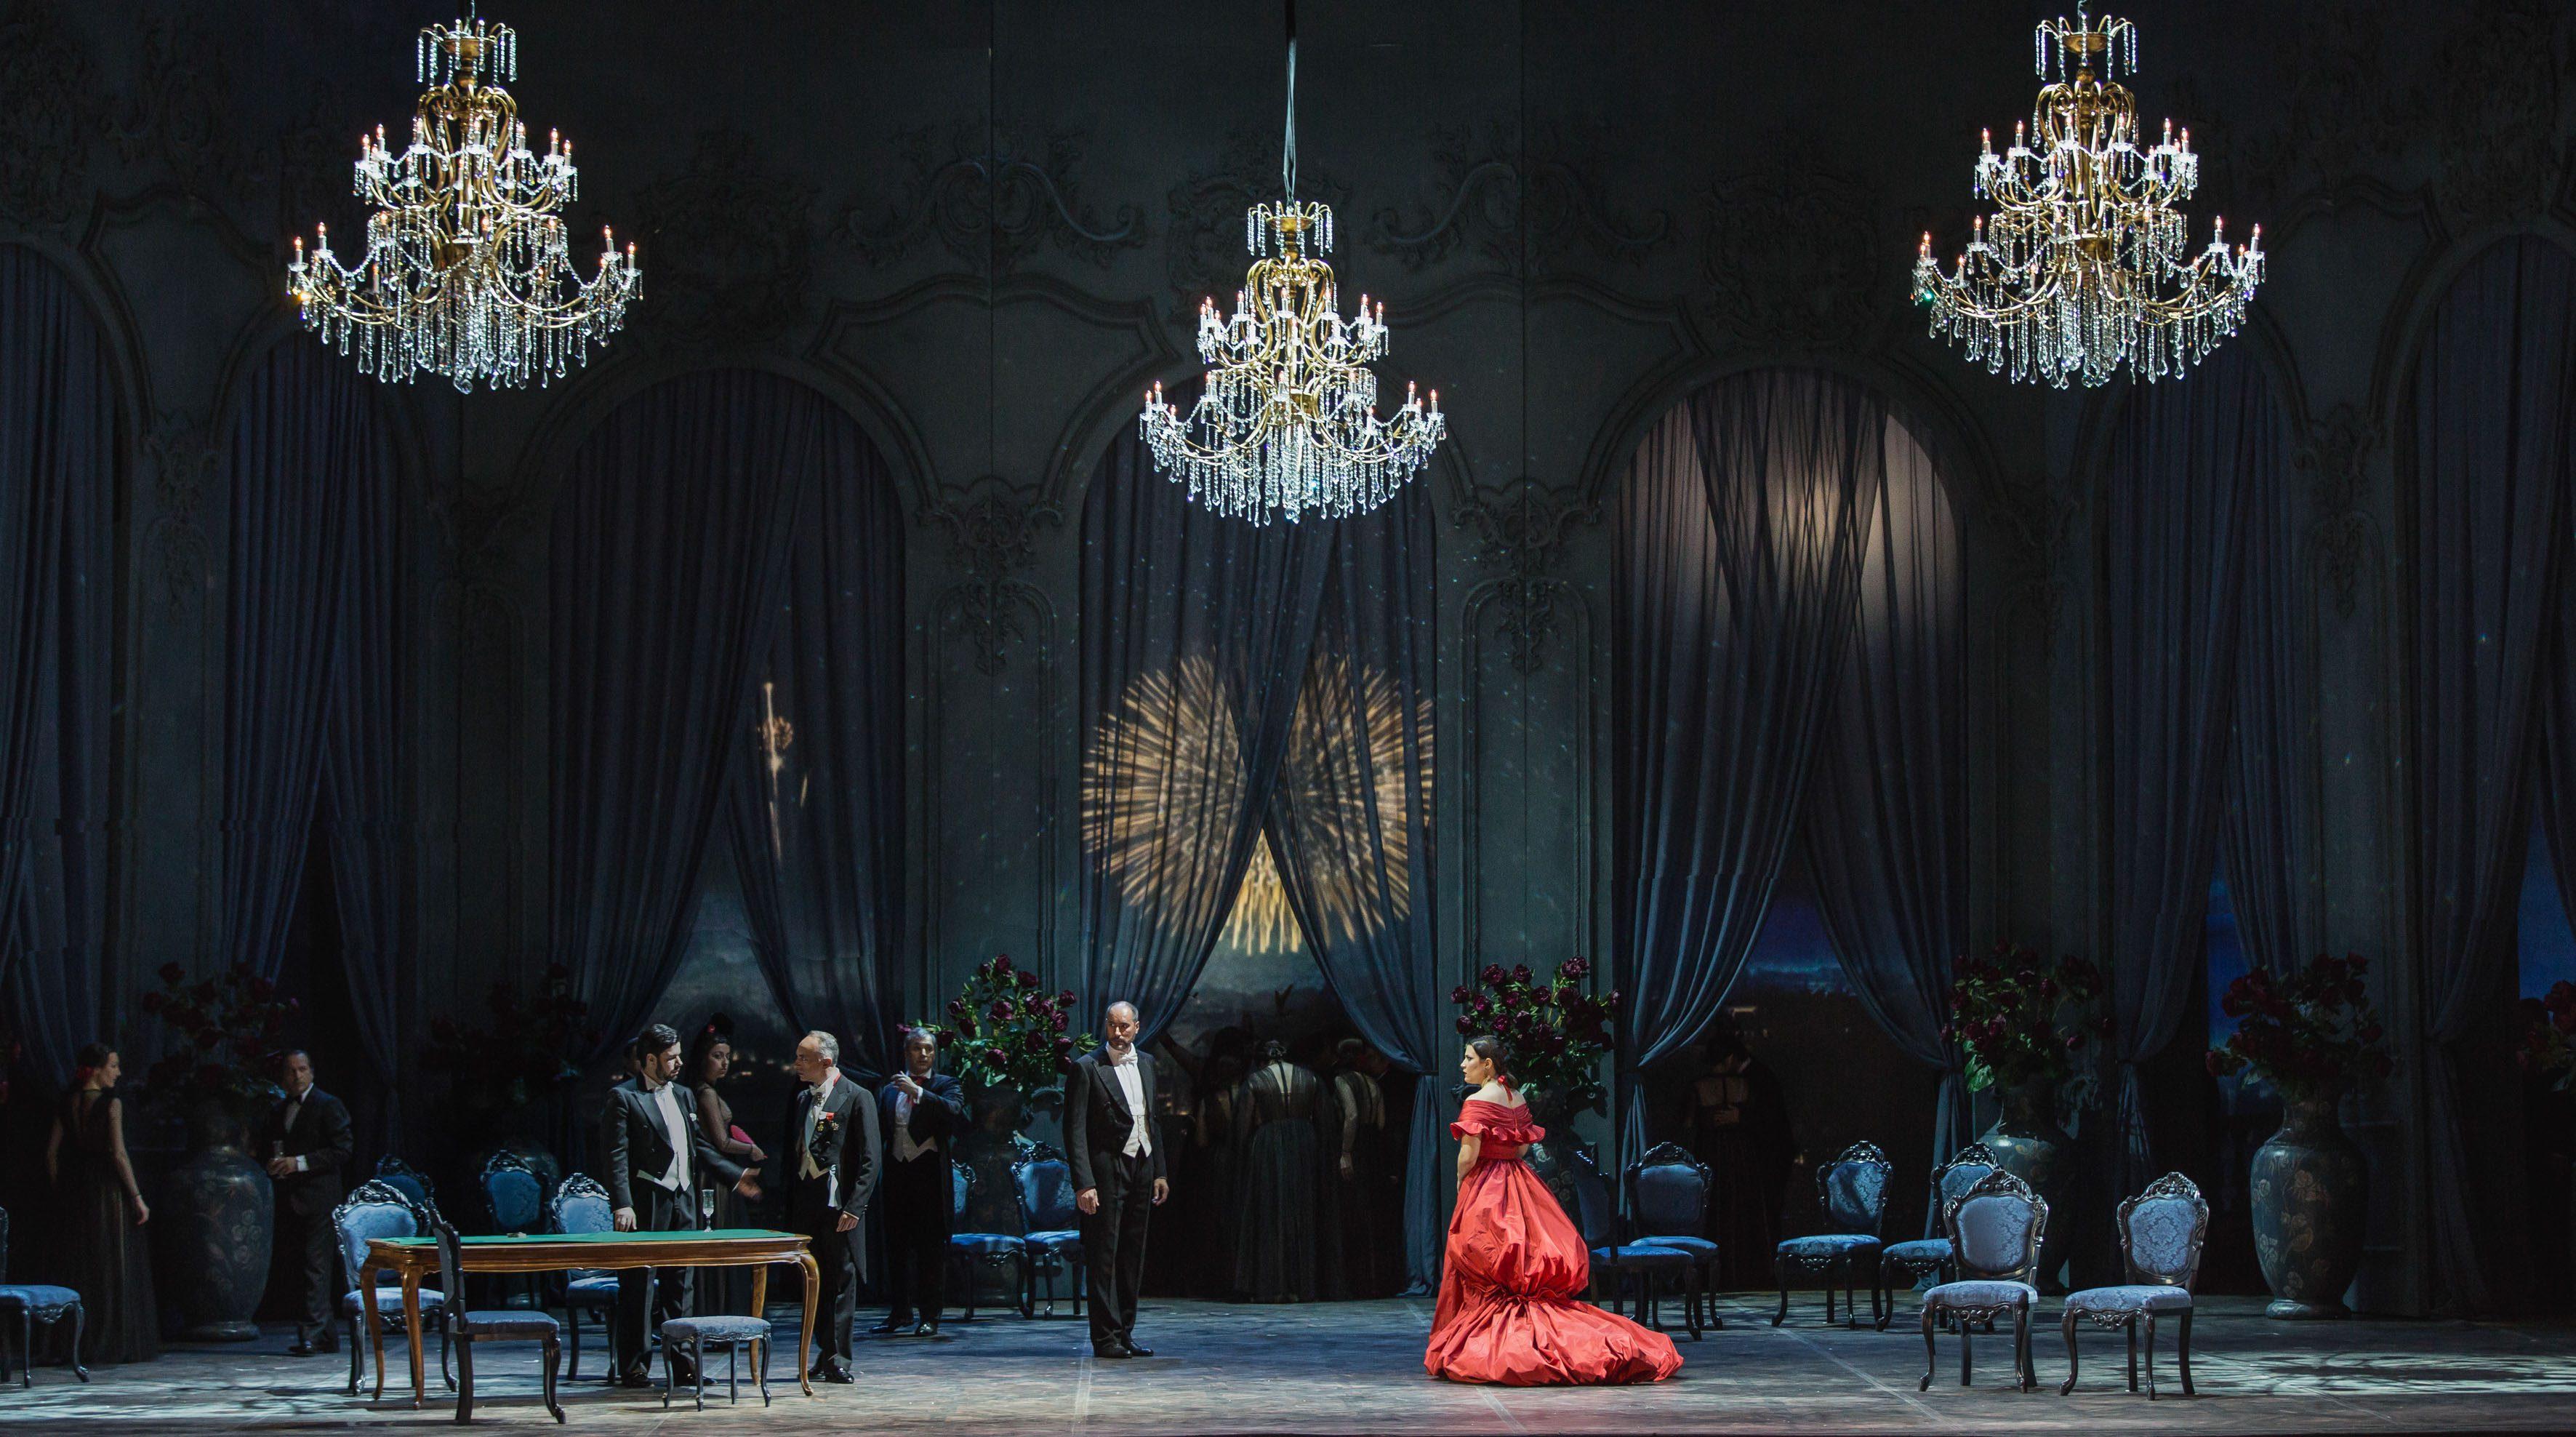 la-traviata un-totaleyasuko-kageyama-opera-di-roma-2015-16 33158